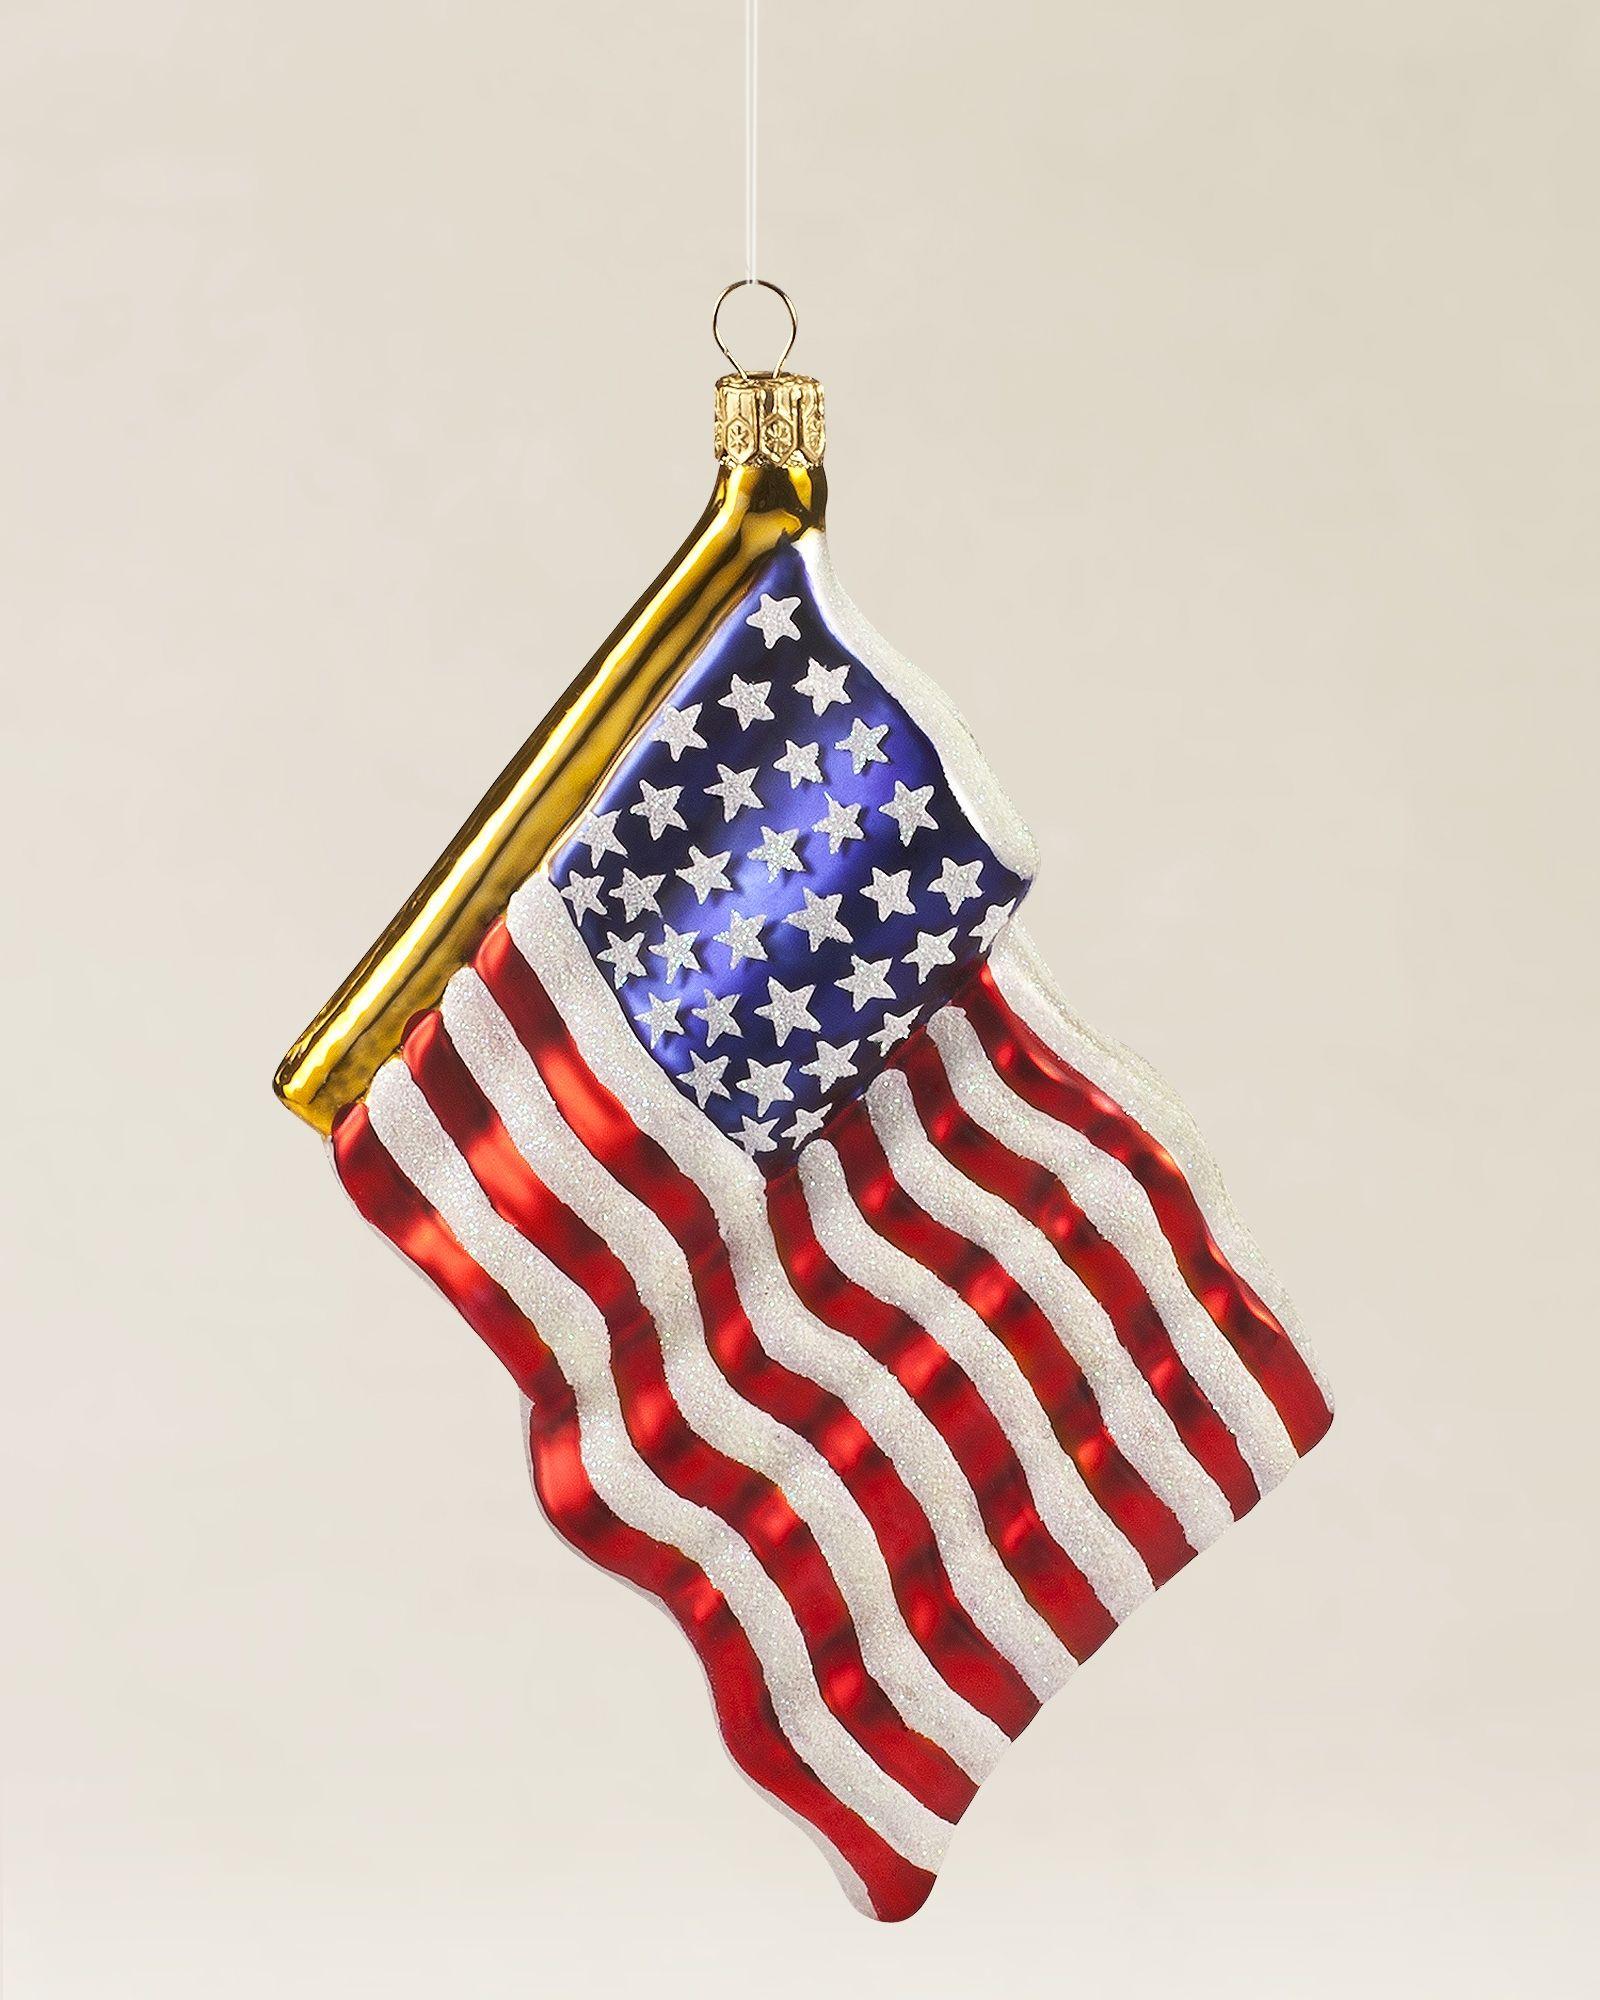 American Flag Blown Glass Ornament